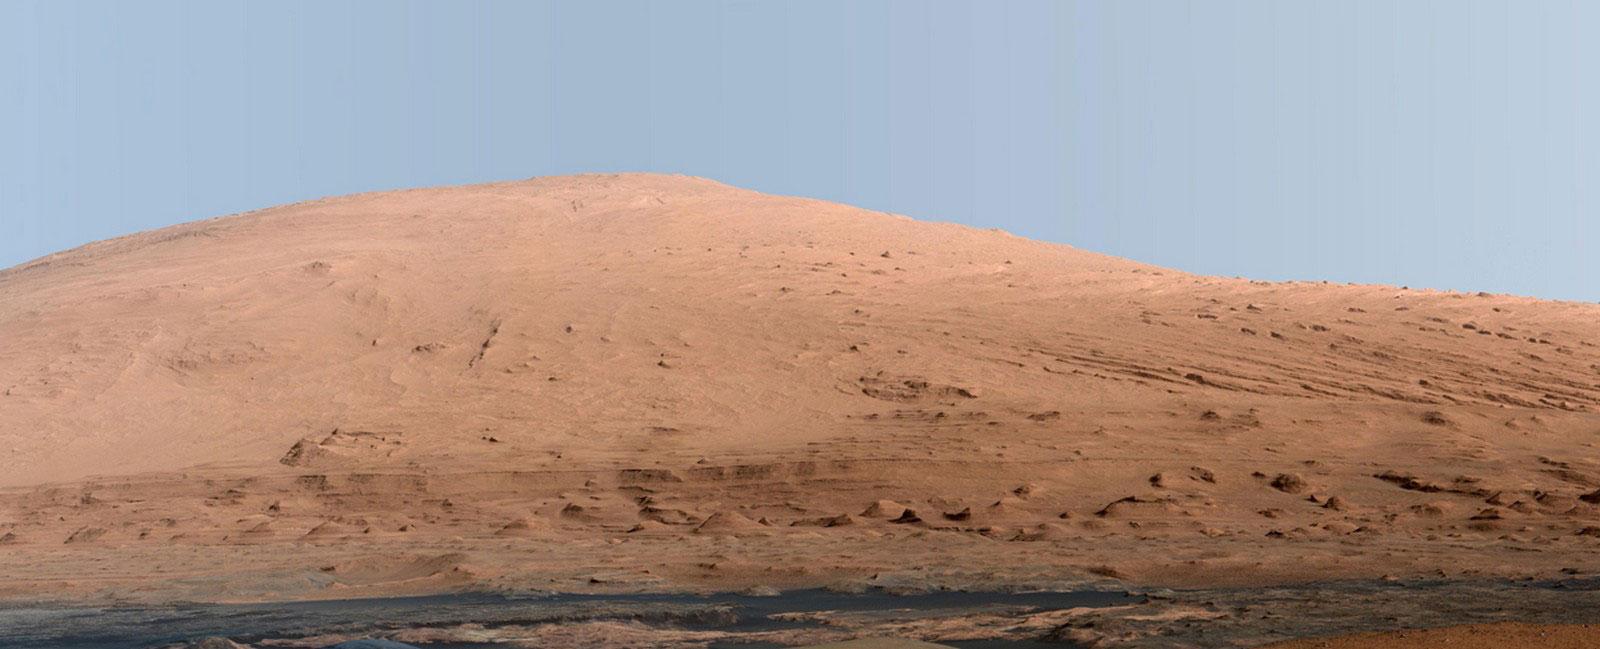 Горы на Марсе